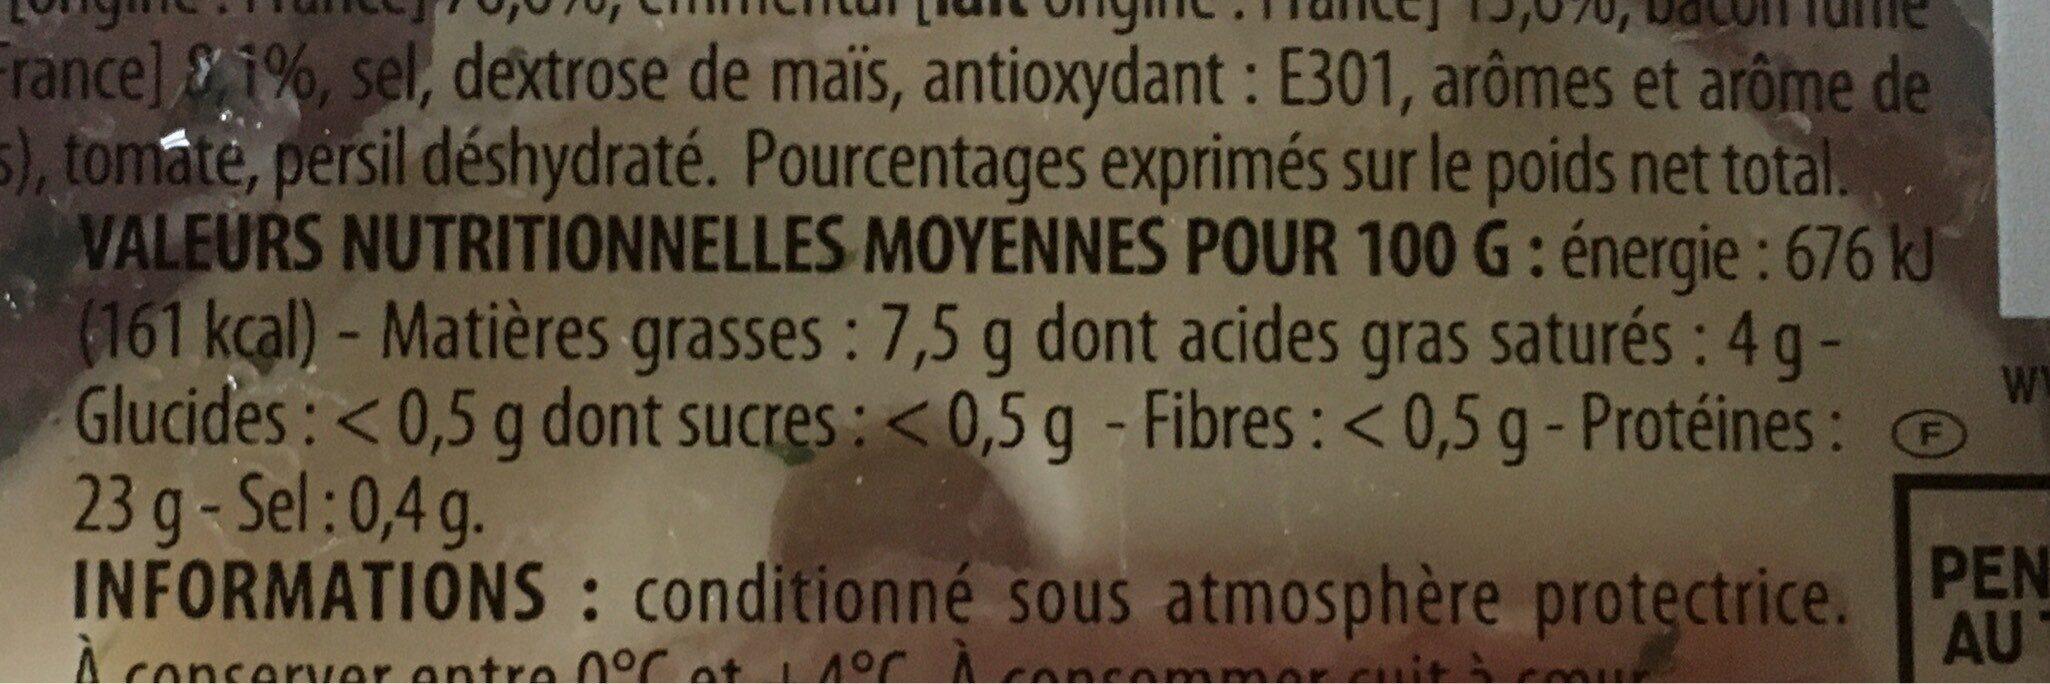 Rôti filet de porc façon Orloff - Valori nutrizionali - fr